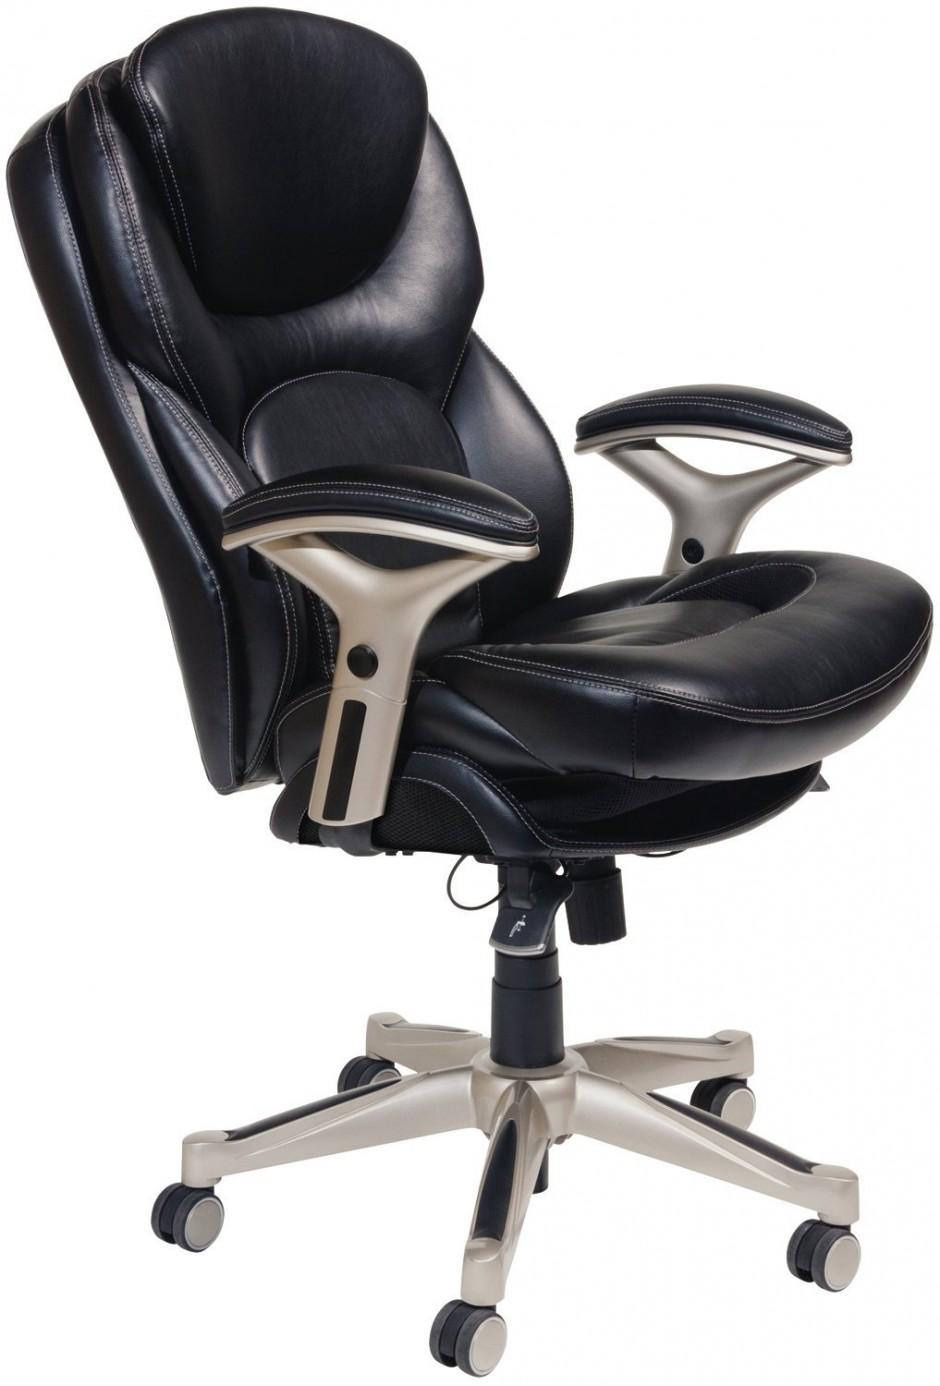 Inspiring Tempur Pedic Tp9000 | Cozy Tempurpedic Computer Chair